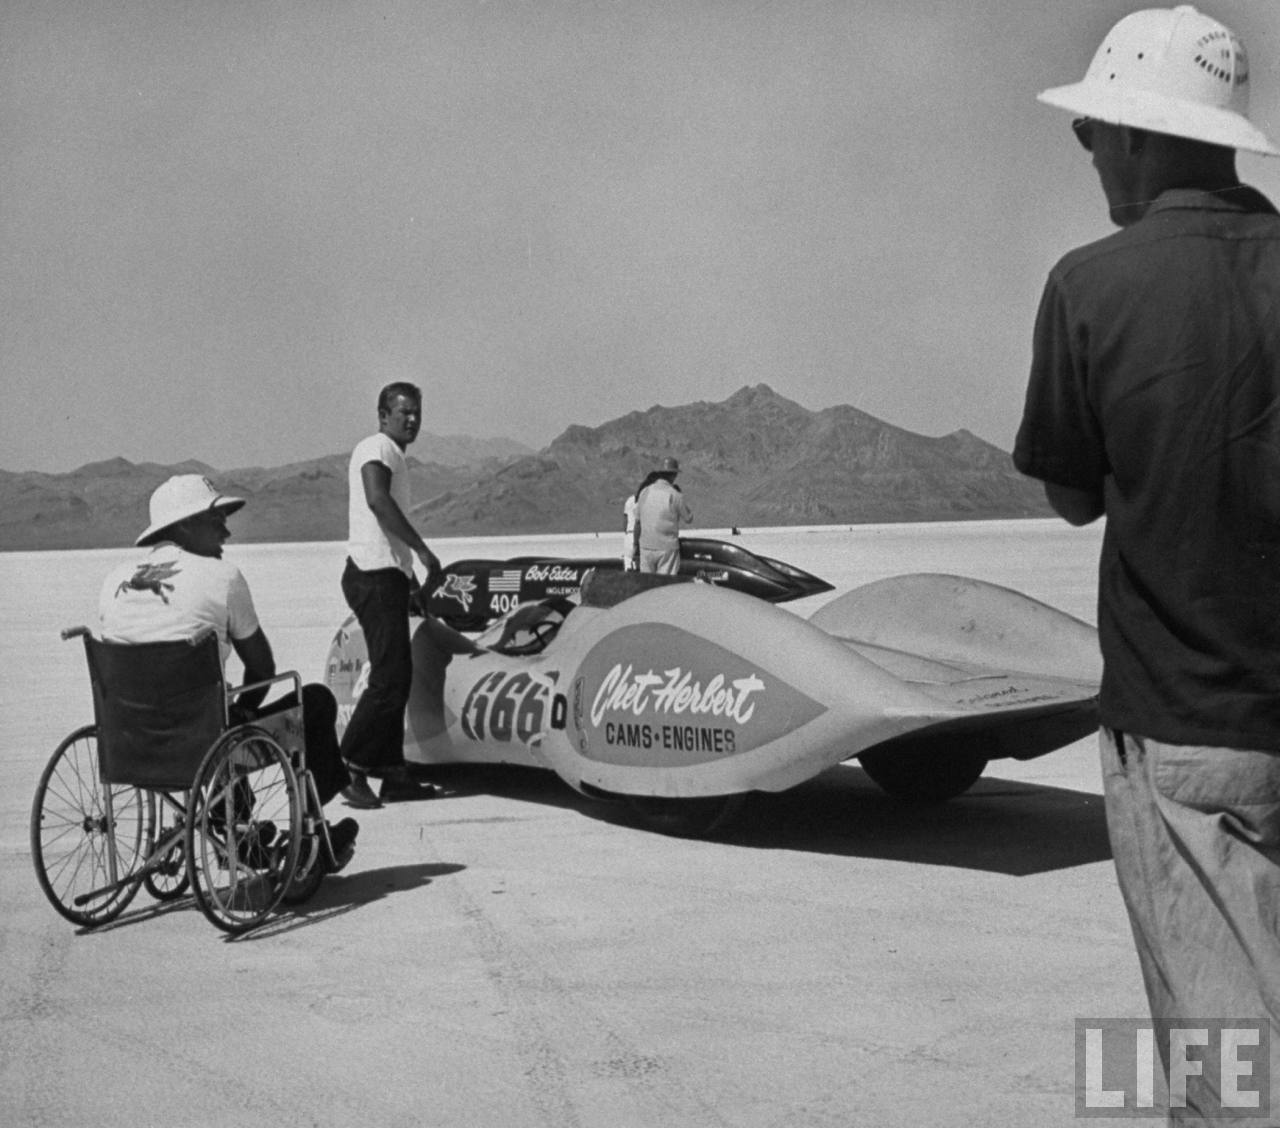 Chet Herbert, a paraplegic, supervising while a man prepares to start his car at Bonneville-- September, 1953.